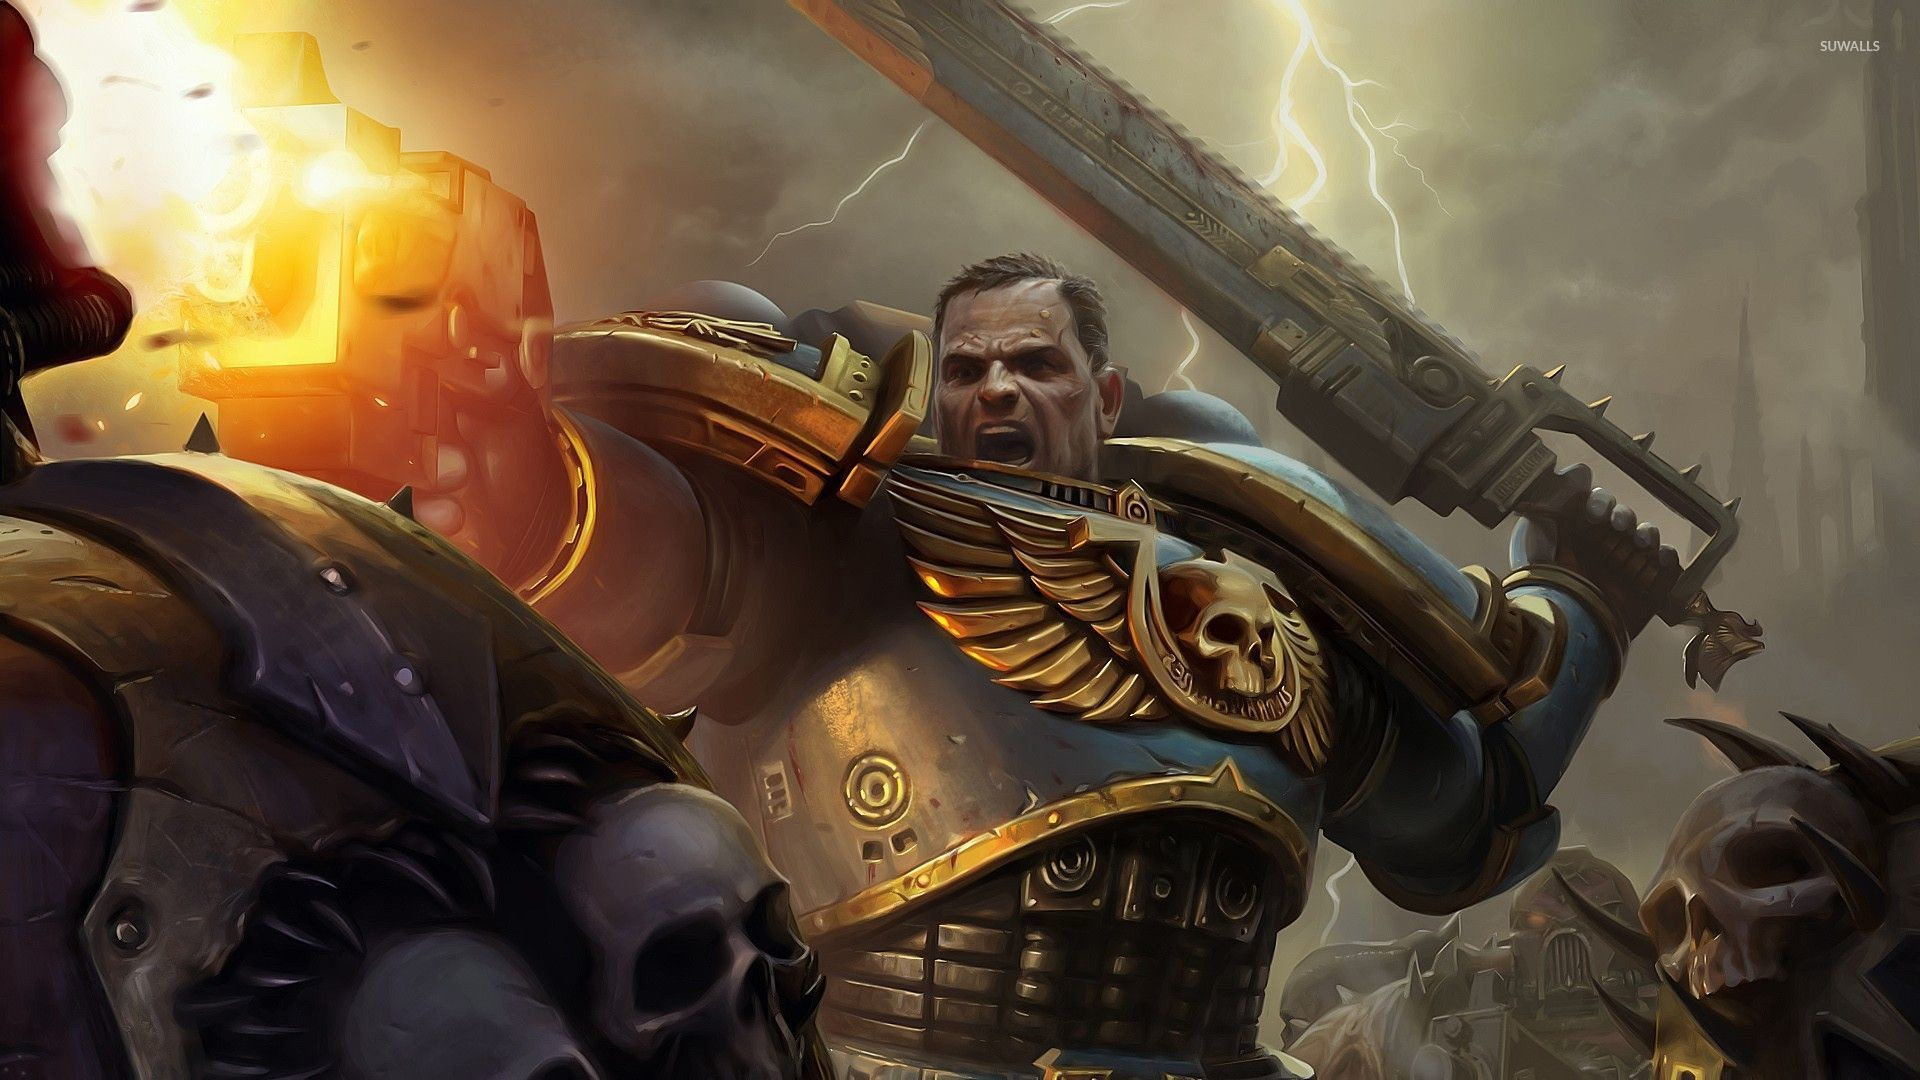 Warhammer 40,000 – Space Marines [5] wallpaper